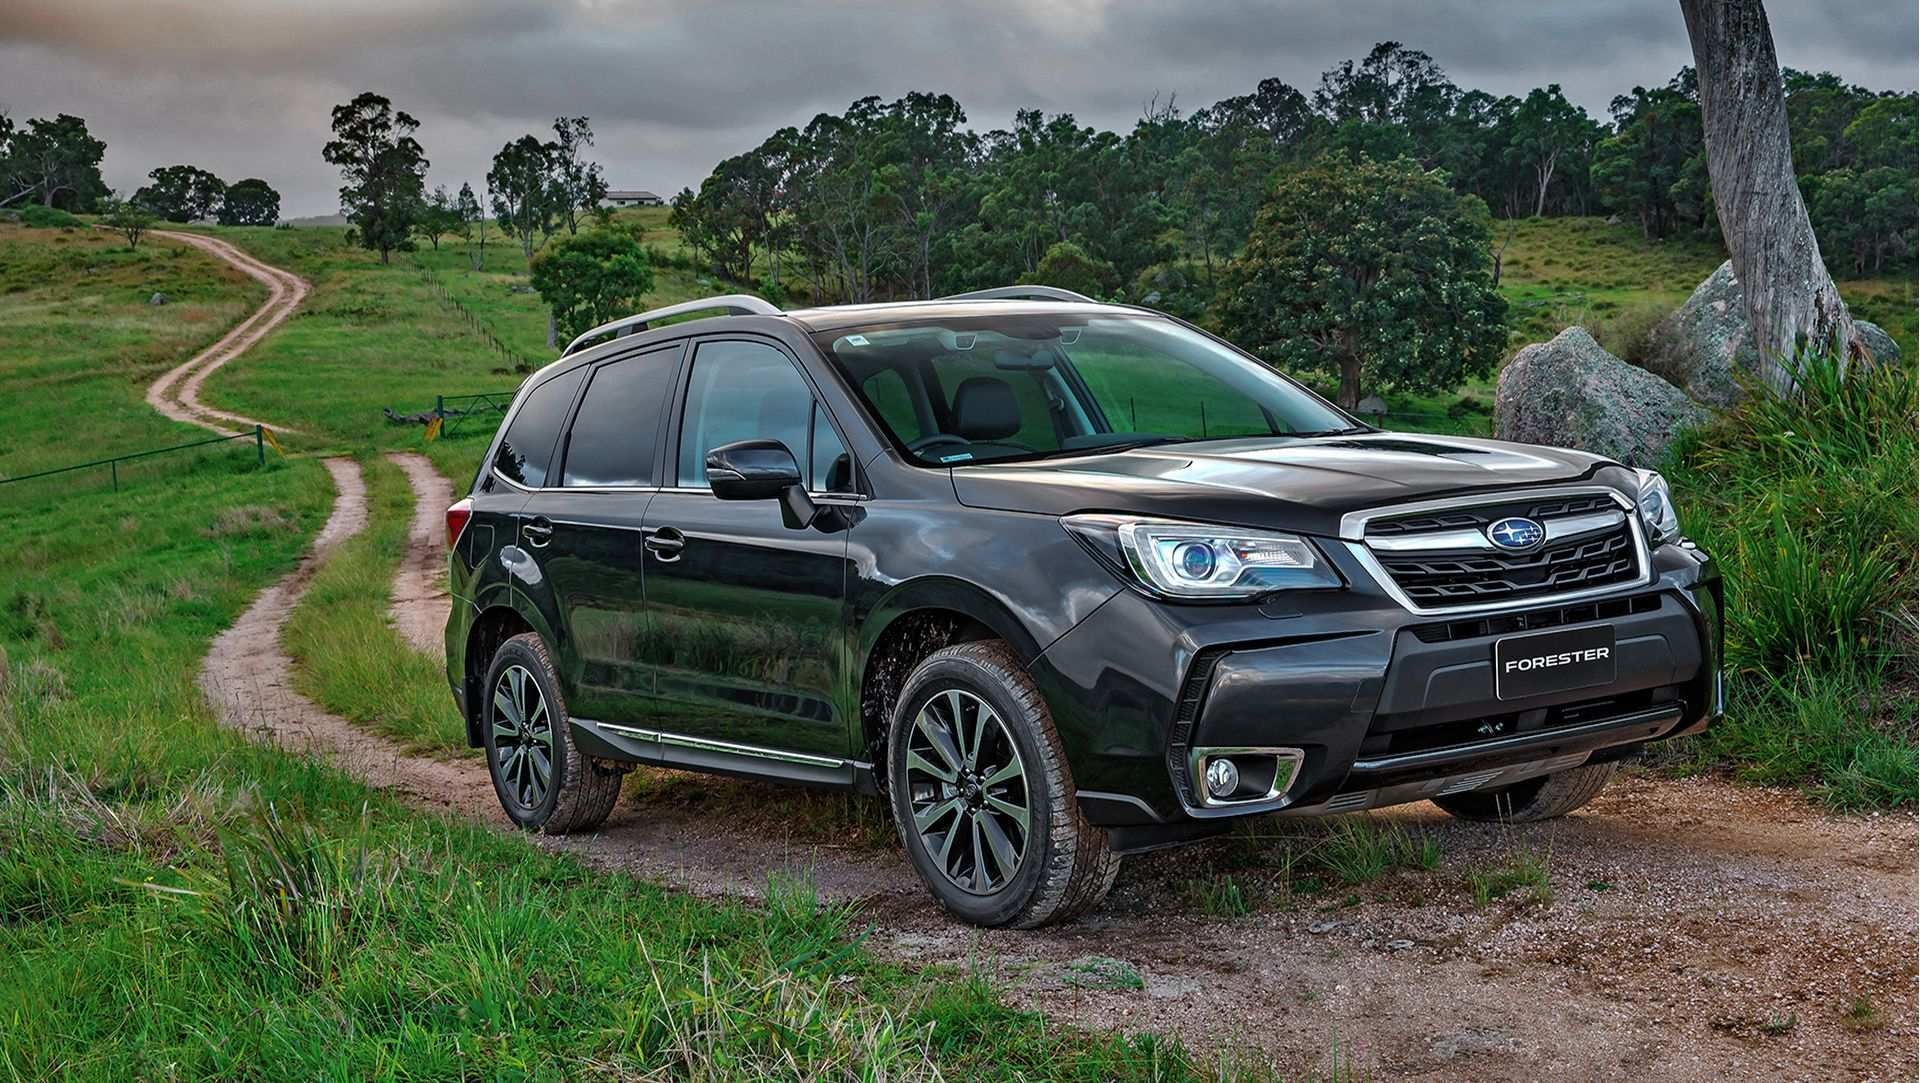 18 Concept of Subaru Forester 2020 Australia Redesign by Subaru Forester 2020 Australia